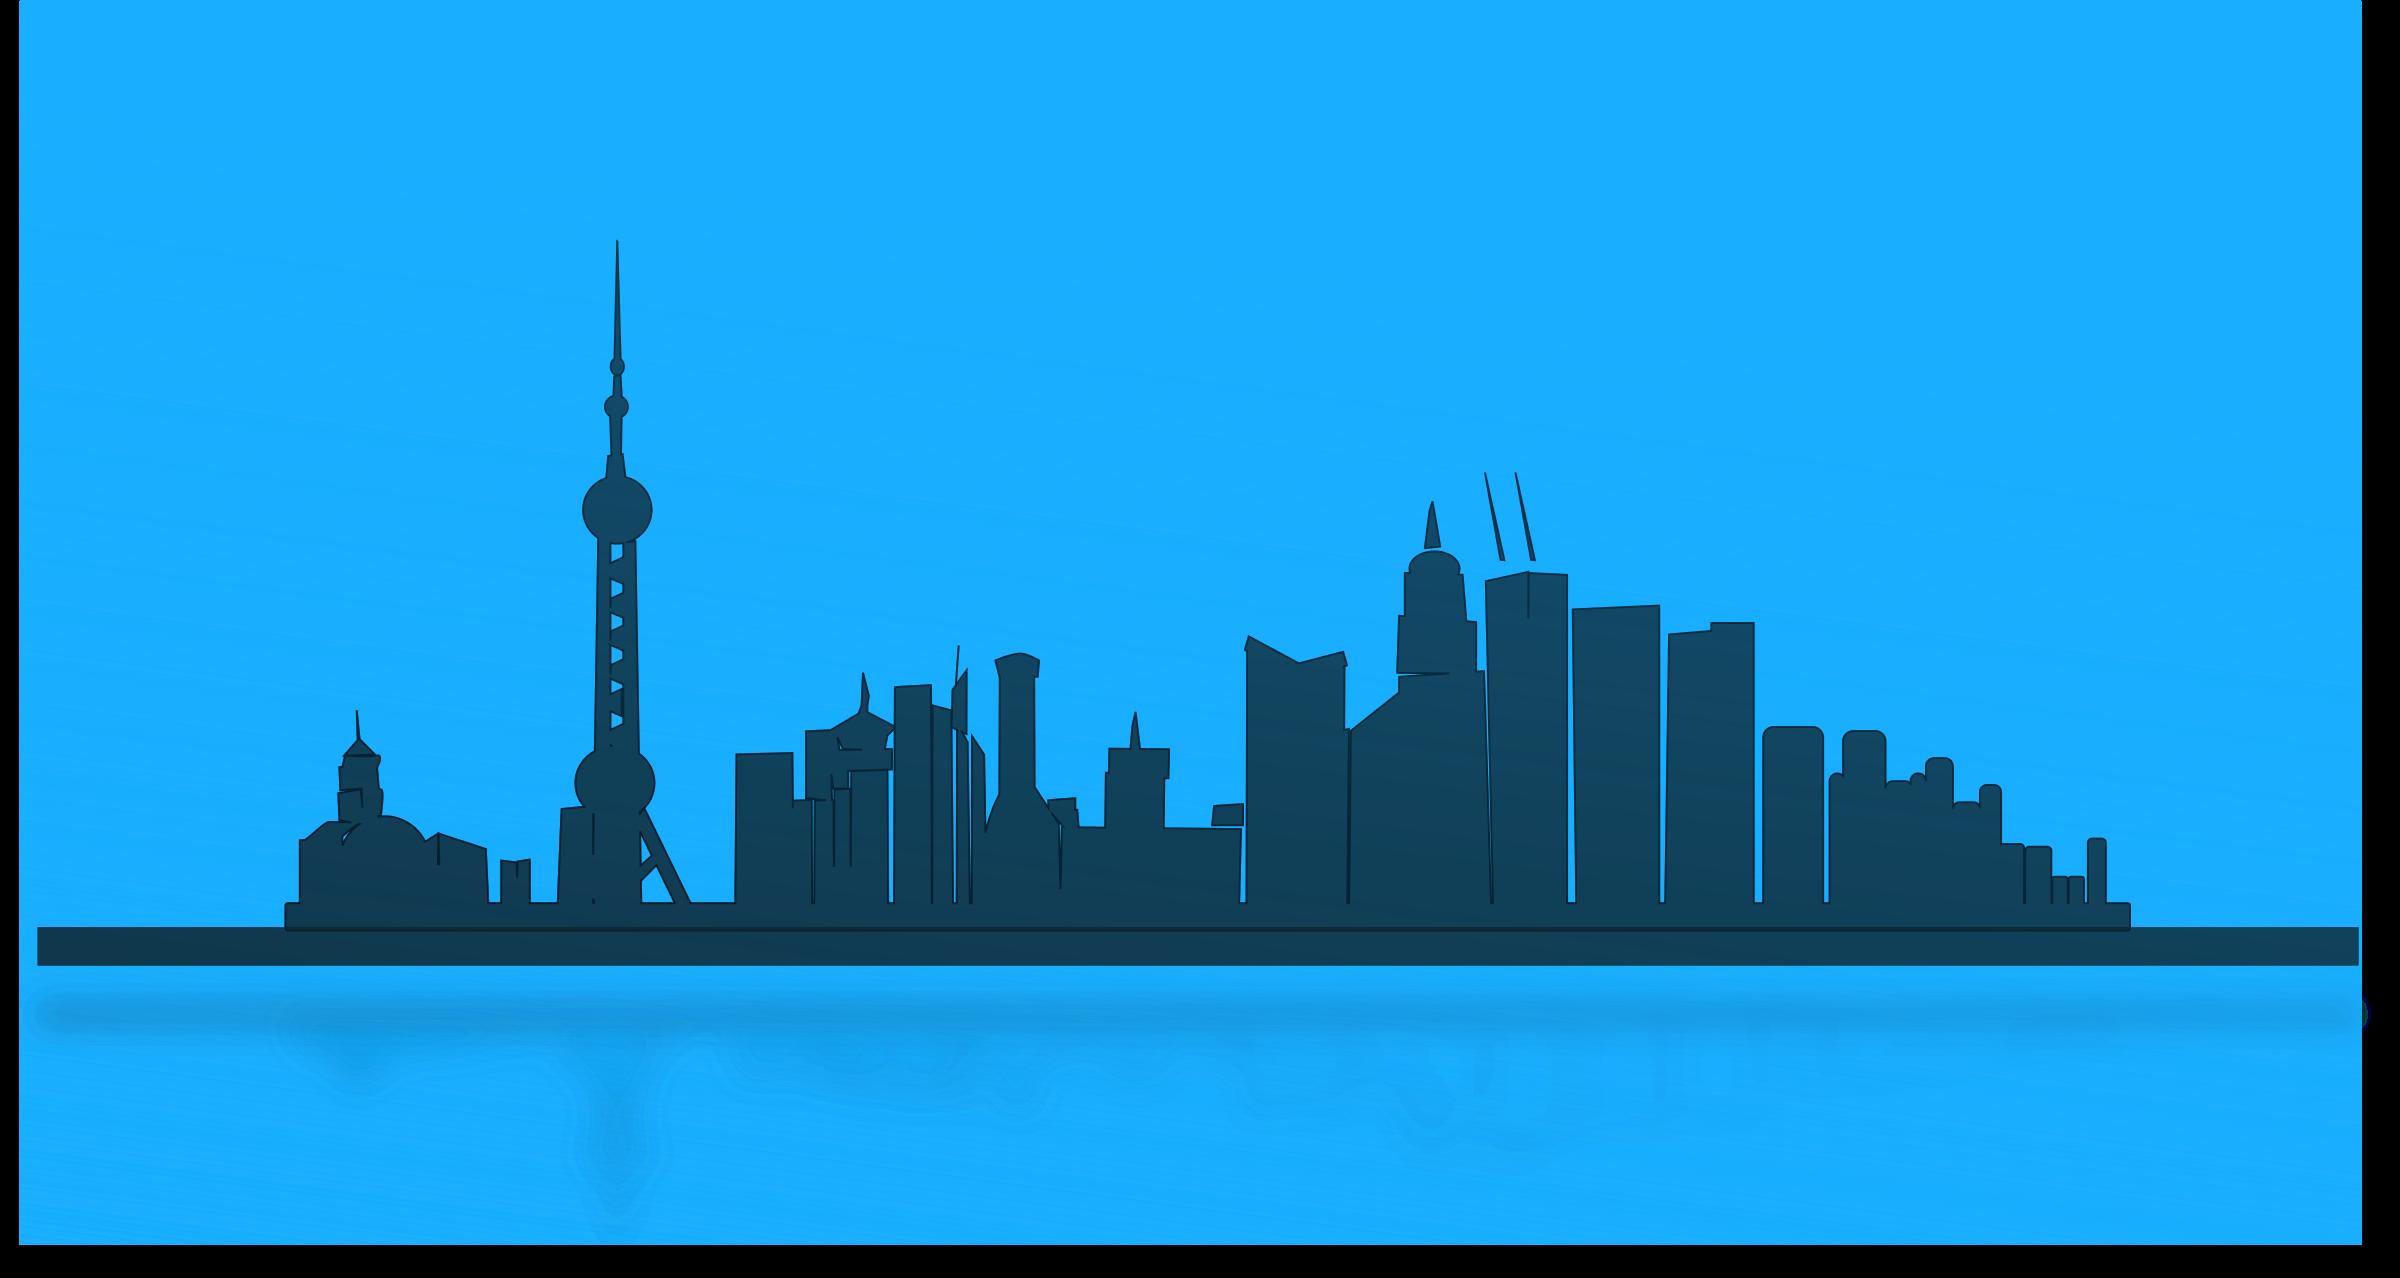 City clipart indonesia. Jokingart com